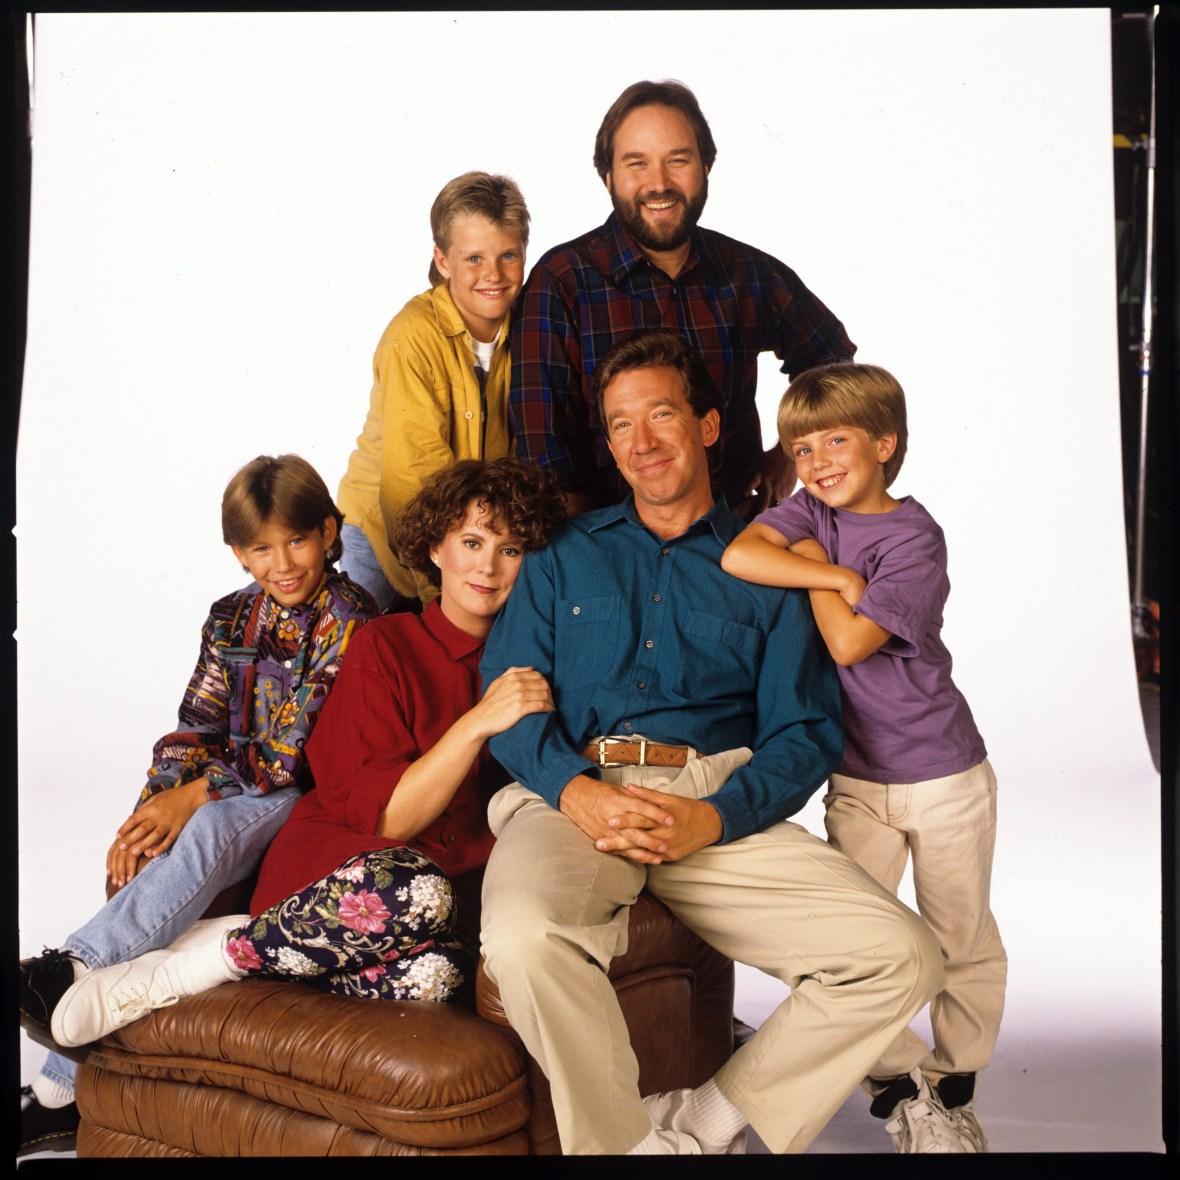 Home Improvement Reboot  Richard Karn Reveals The Cast Is